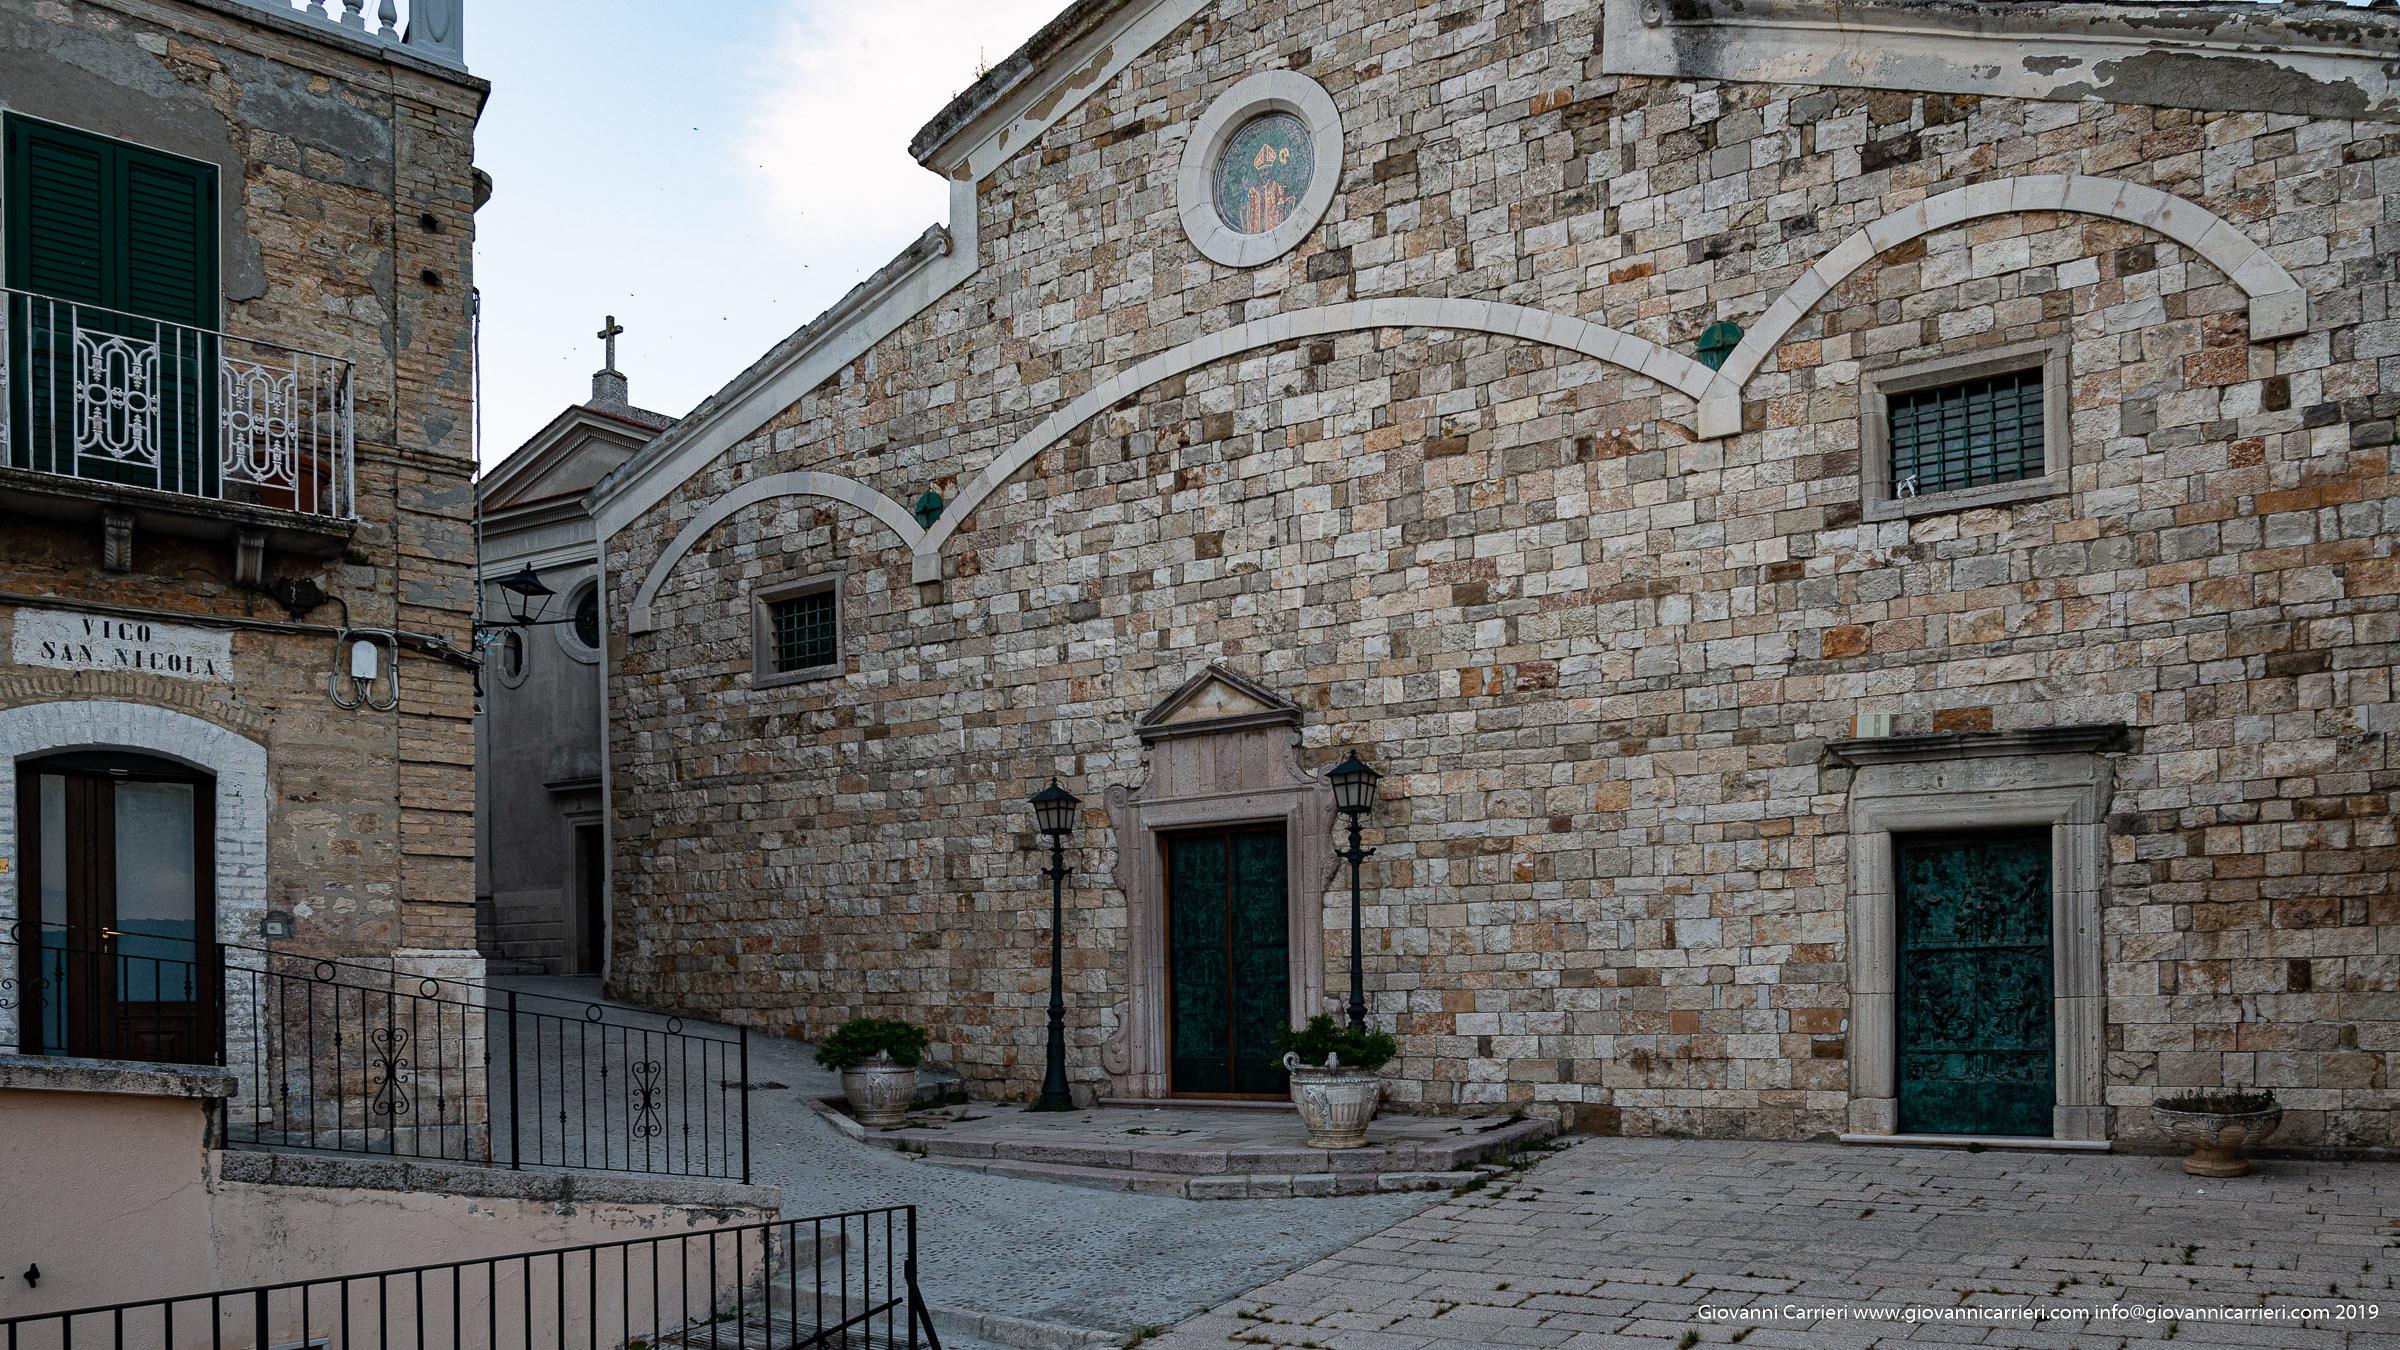 The facade of the mother church of Sant'Agata di Puglia